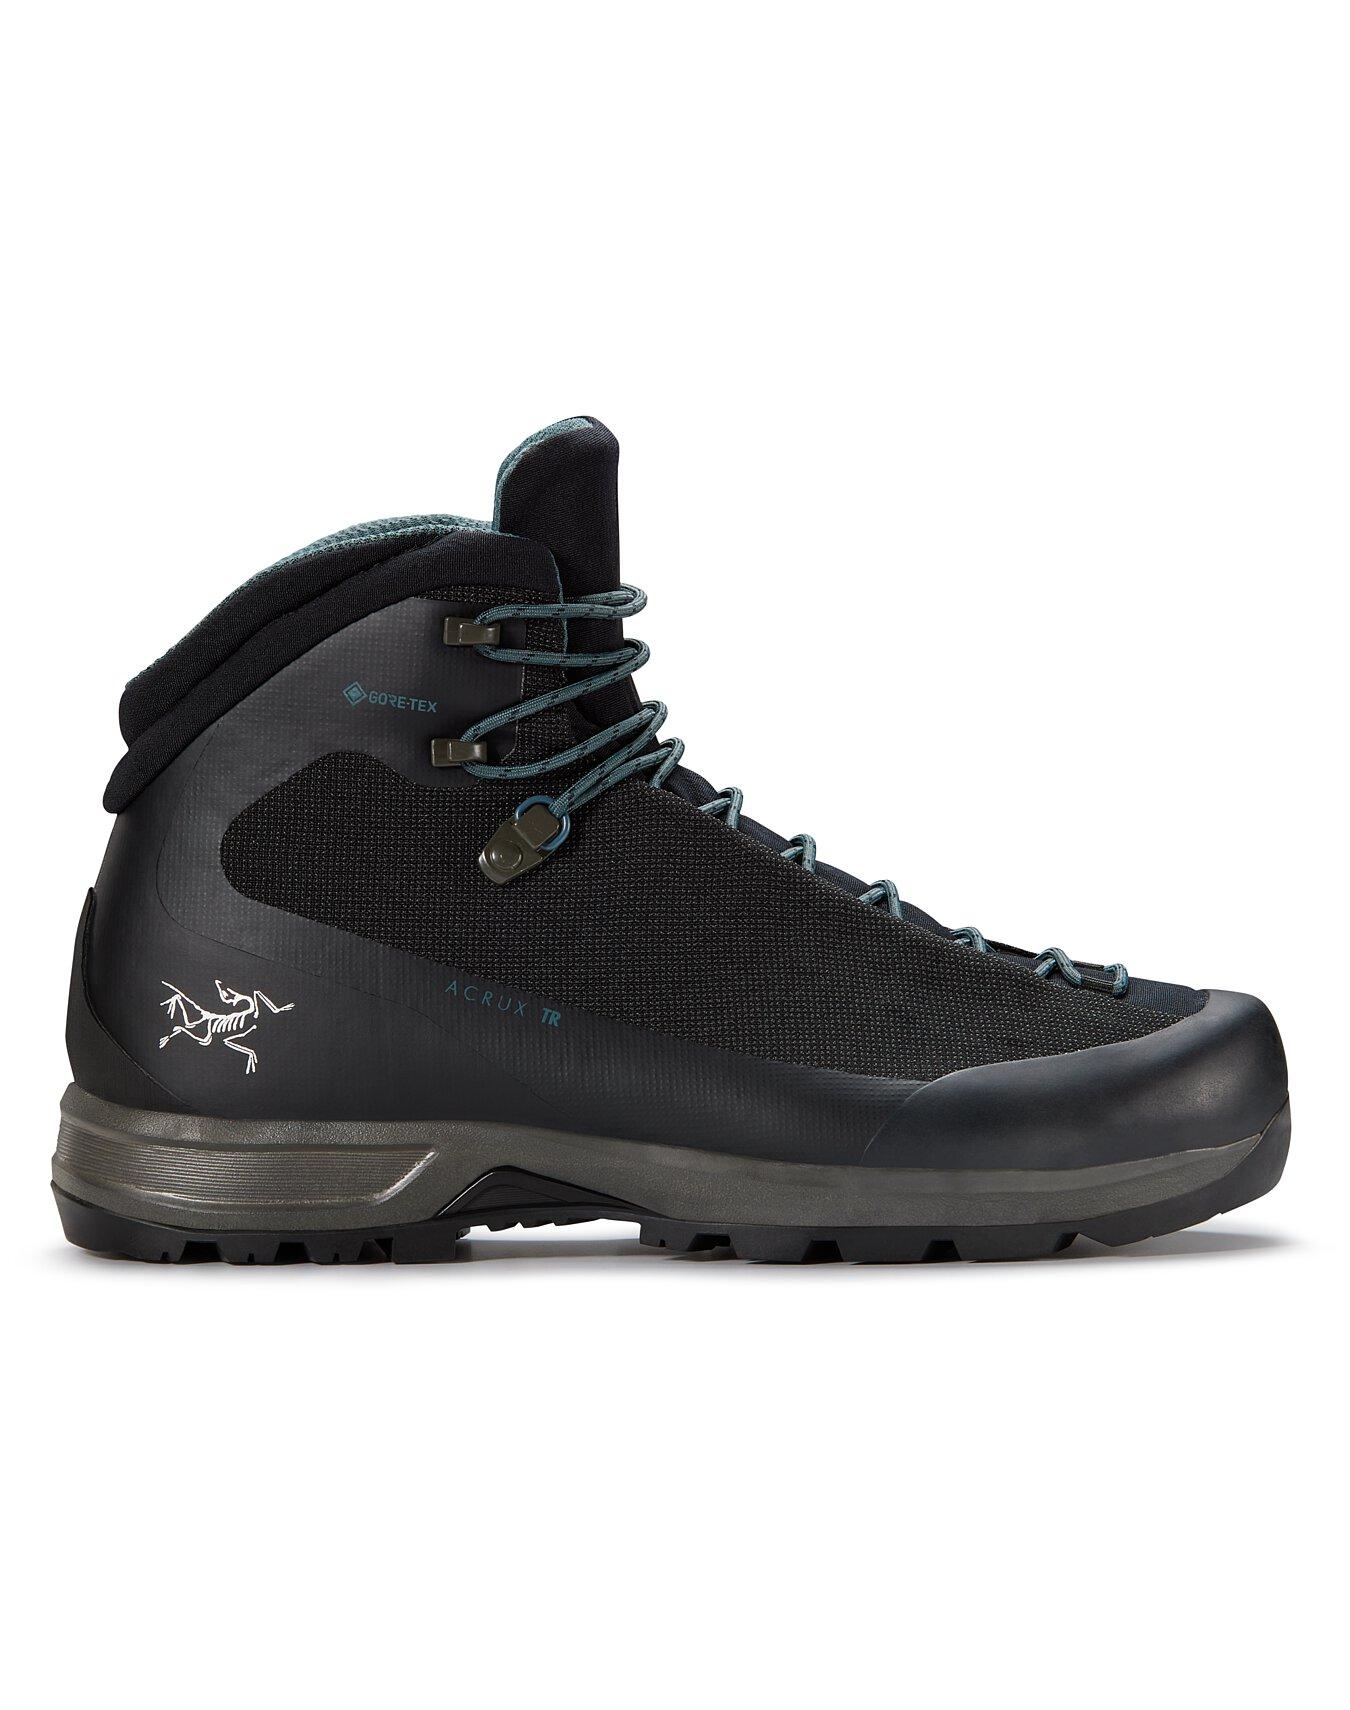 Acrux TR GTX Boot Men's